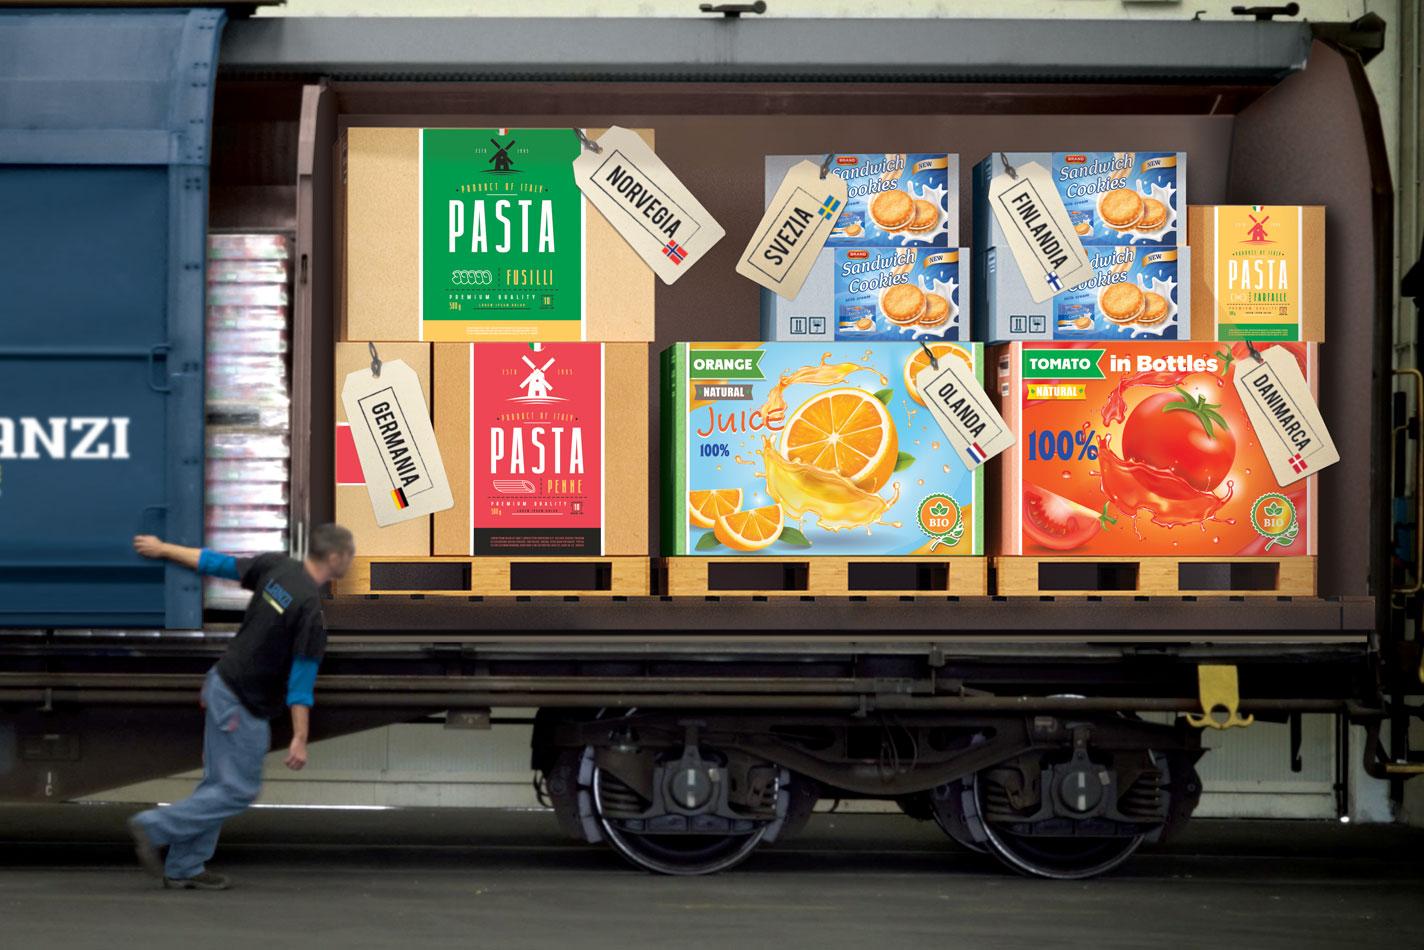 Lanzi Adv terminal ferroviario